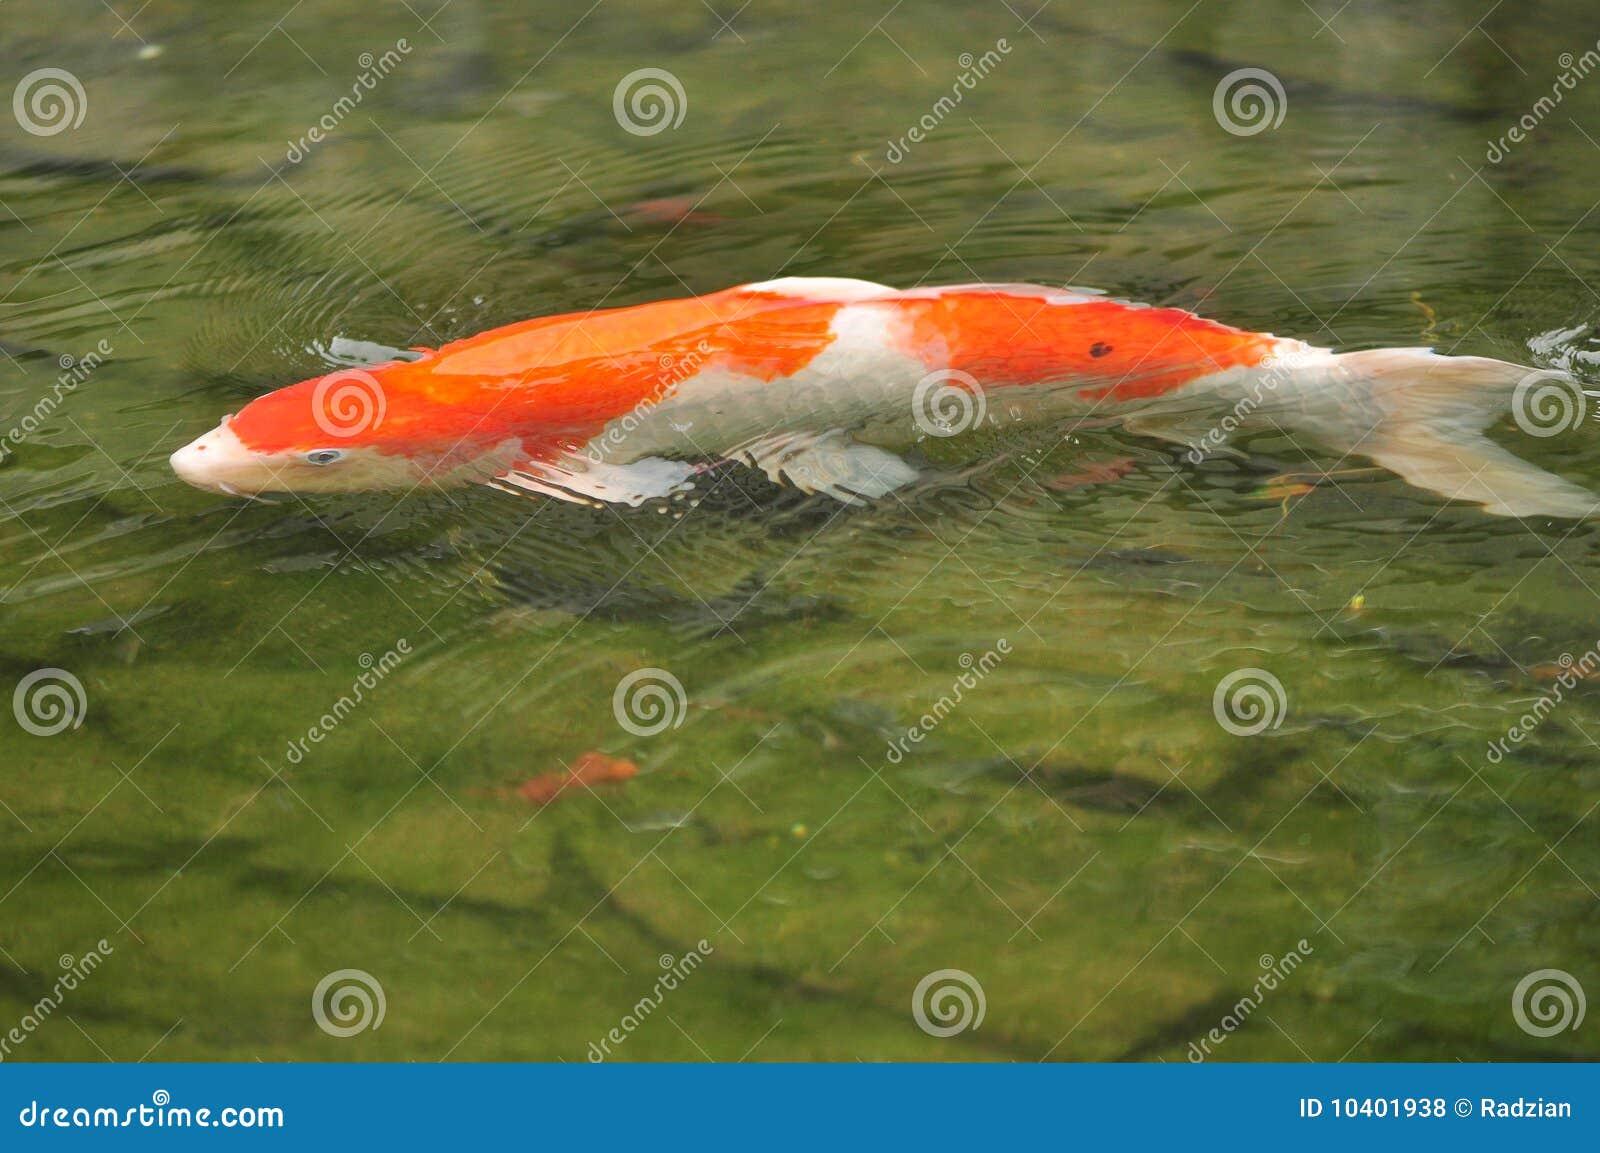 Koi carp fish stock photo image of pads single green for Japanese carp fish